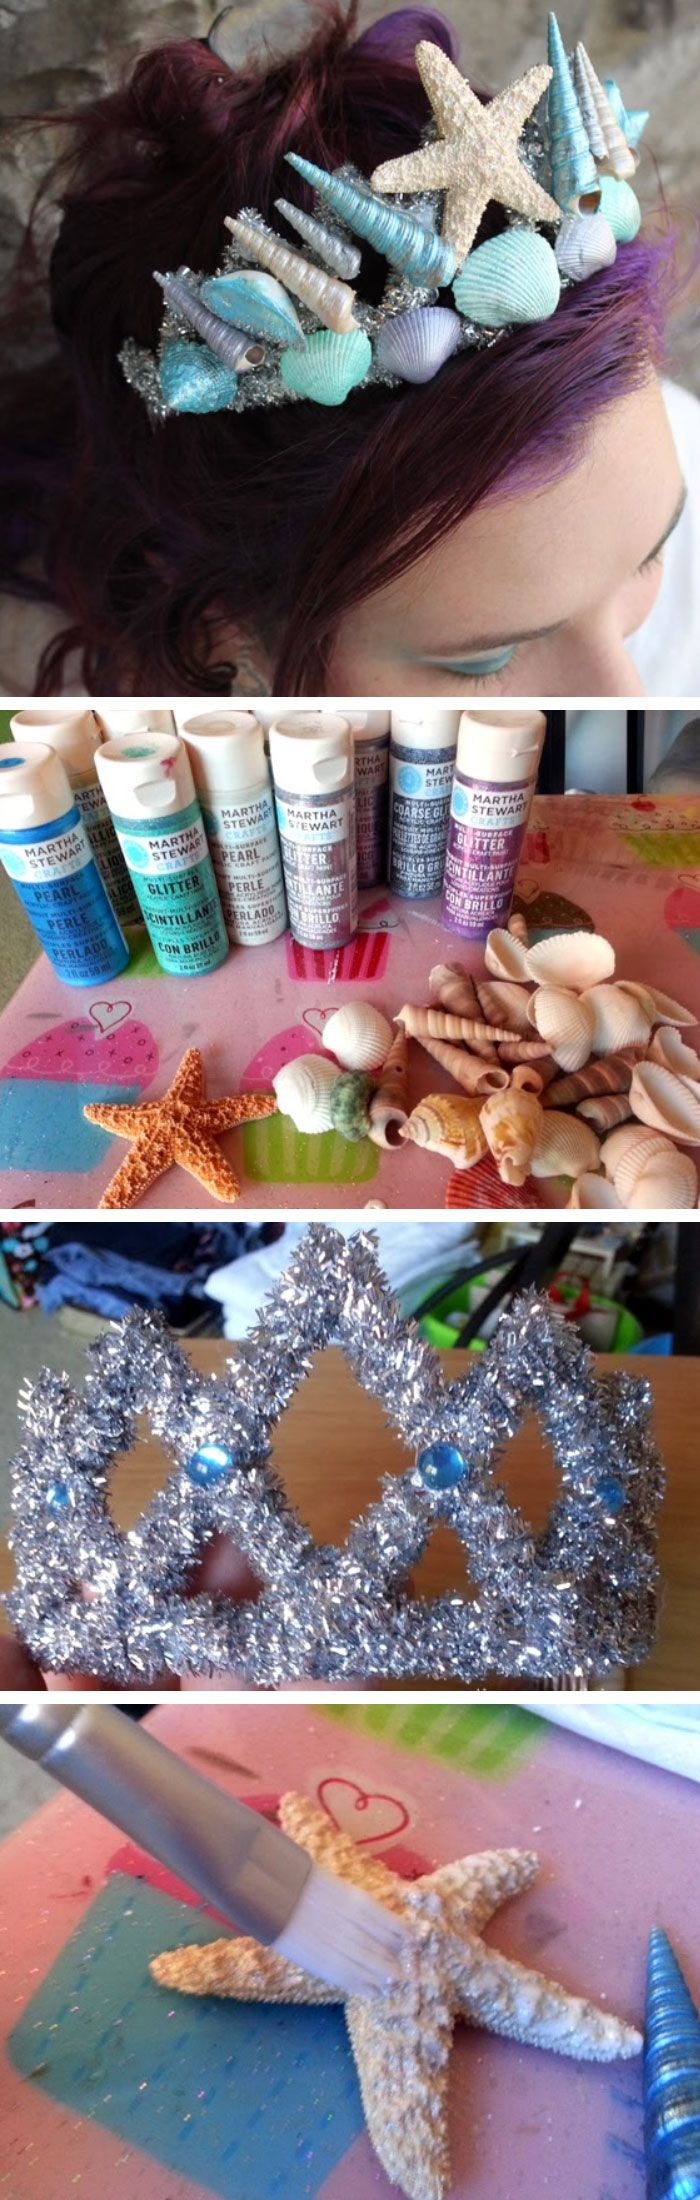 best 25 seashell decorations ideas on pinterest seashell crafts 18 diy seashell decorating and craft ideas